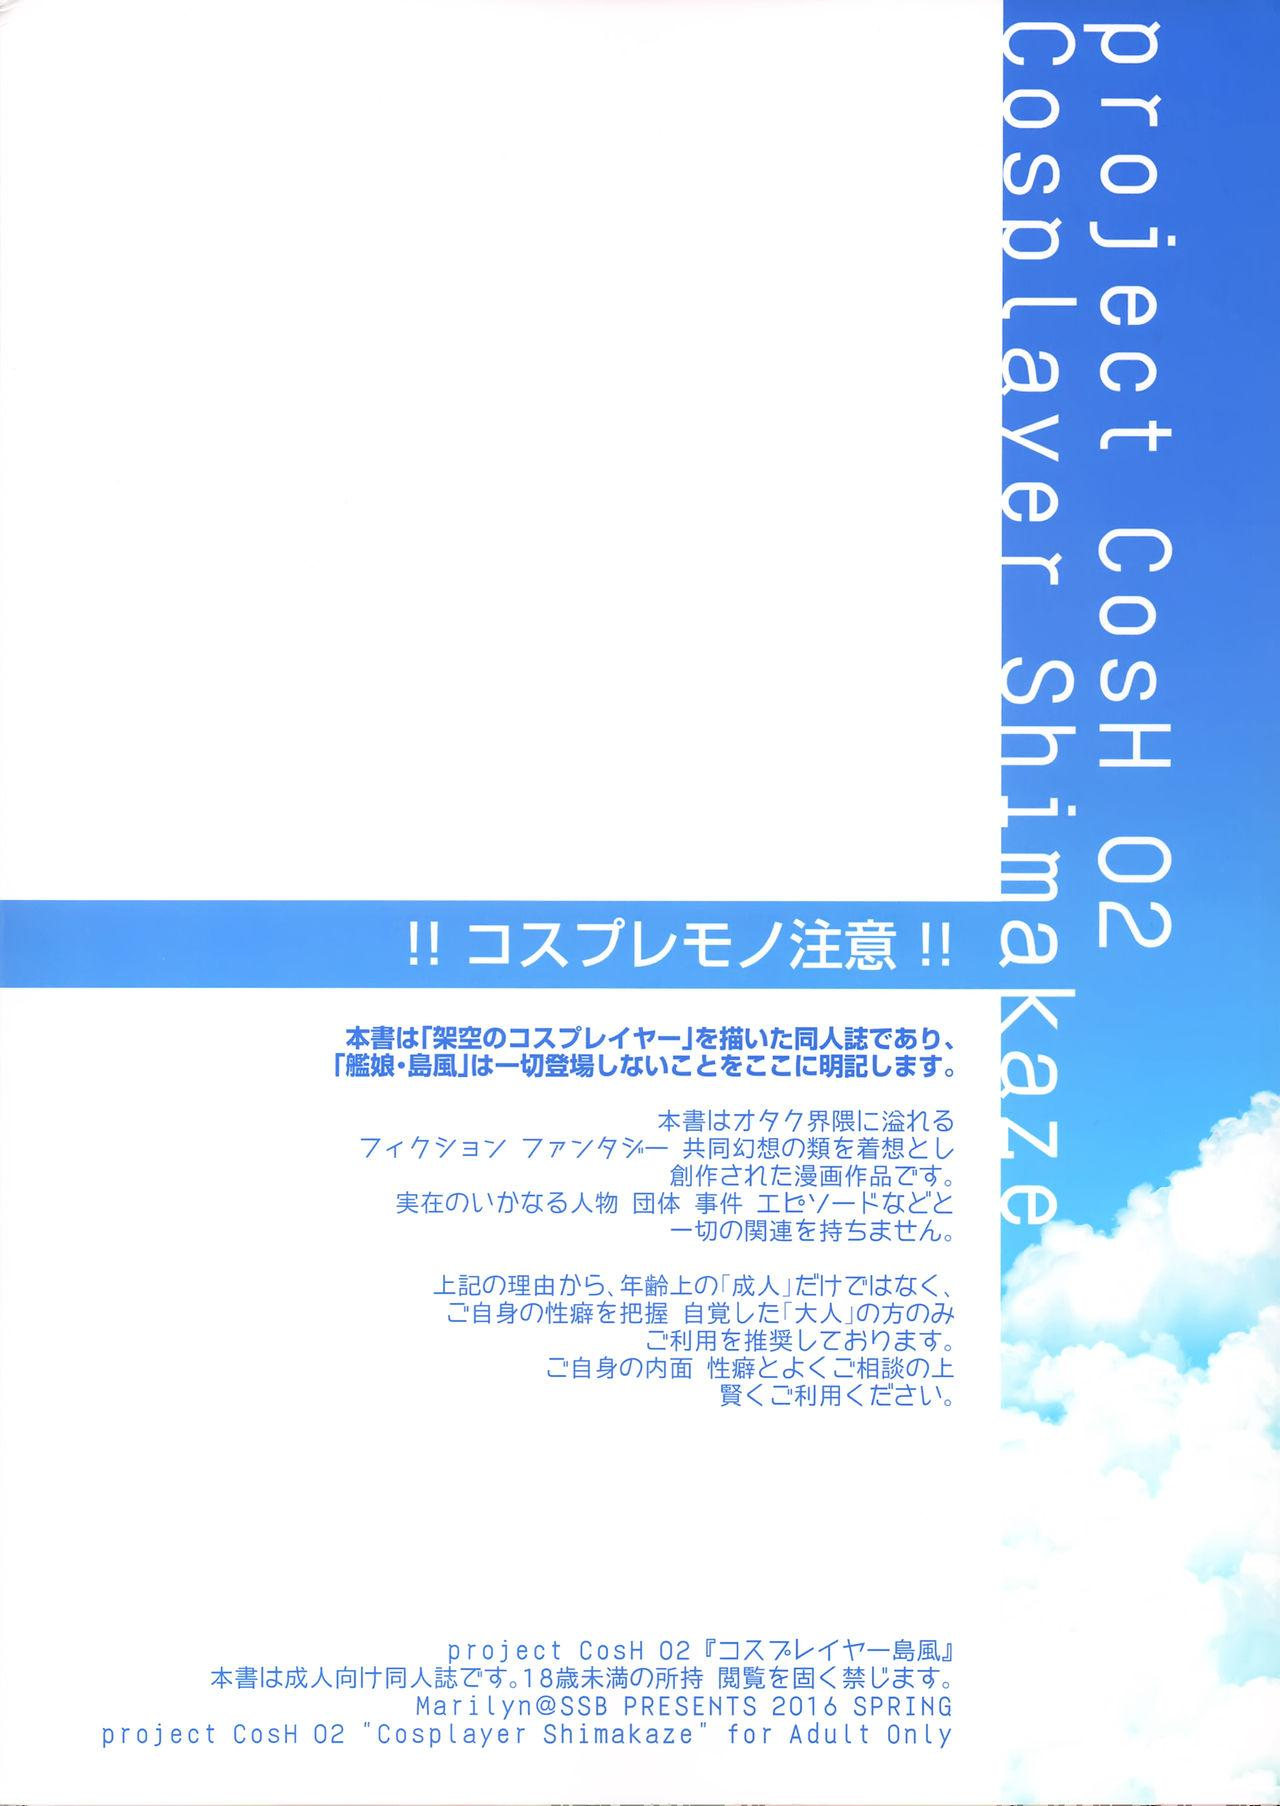 Cosplayer Shimakaze 22